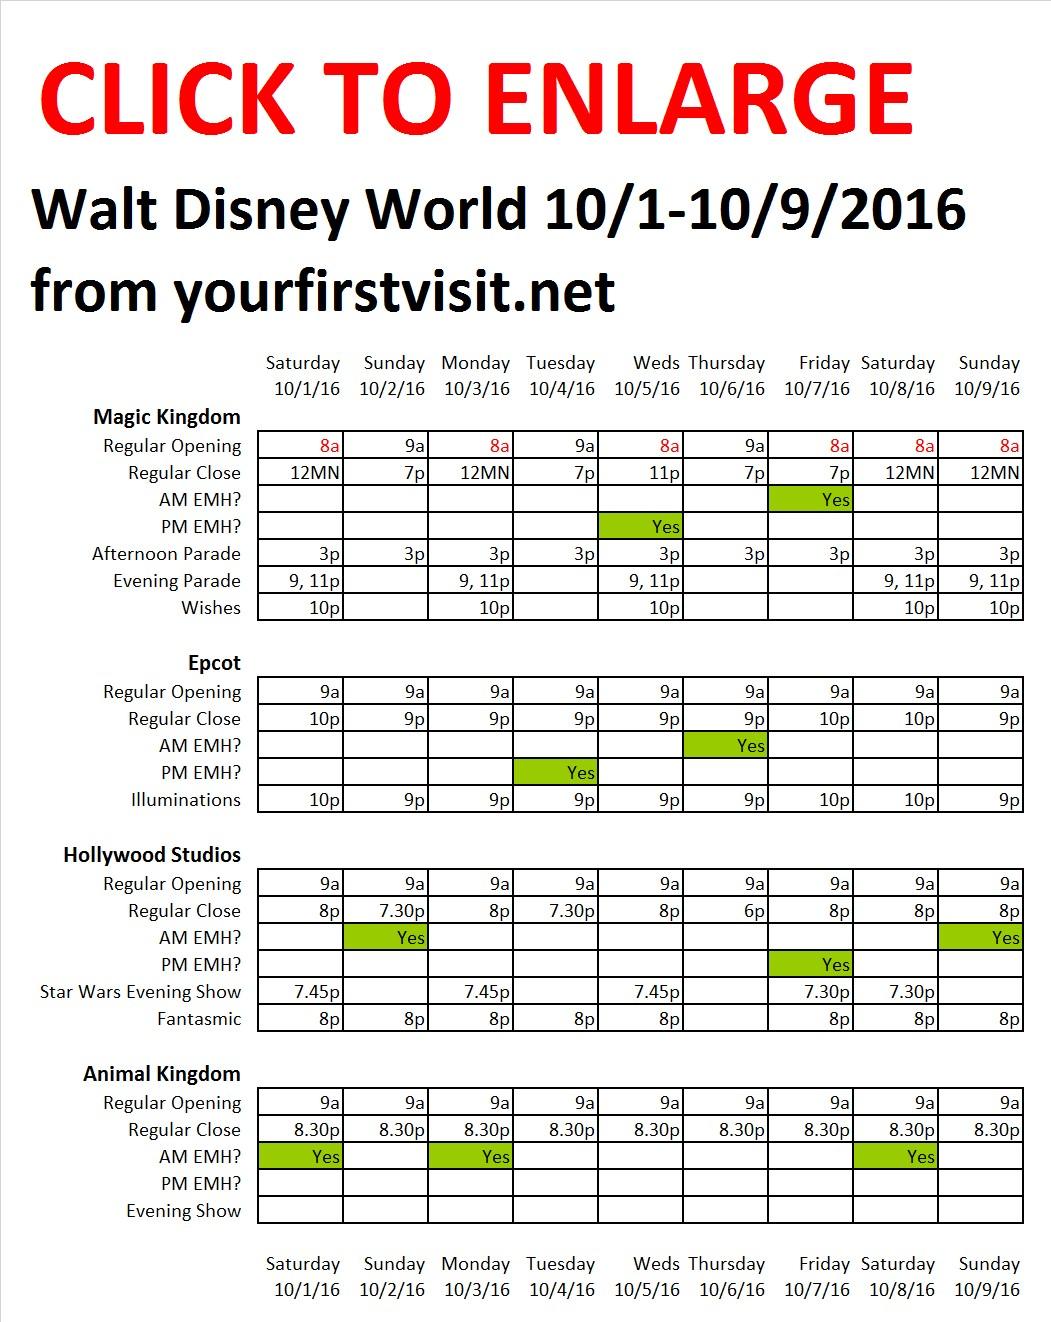 disney-world-10-1-to-10-9-2016-from-yourfirstvisit-net